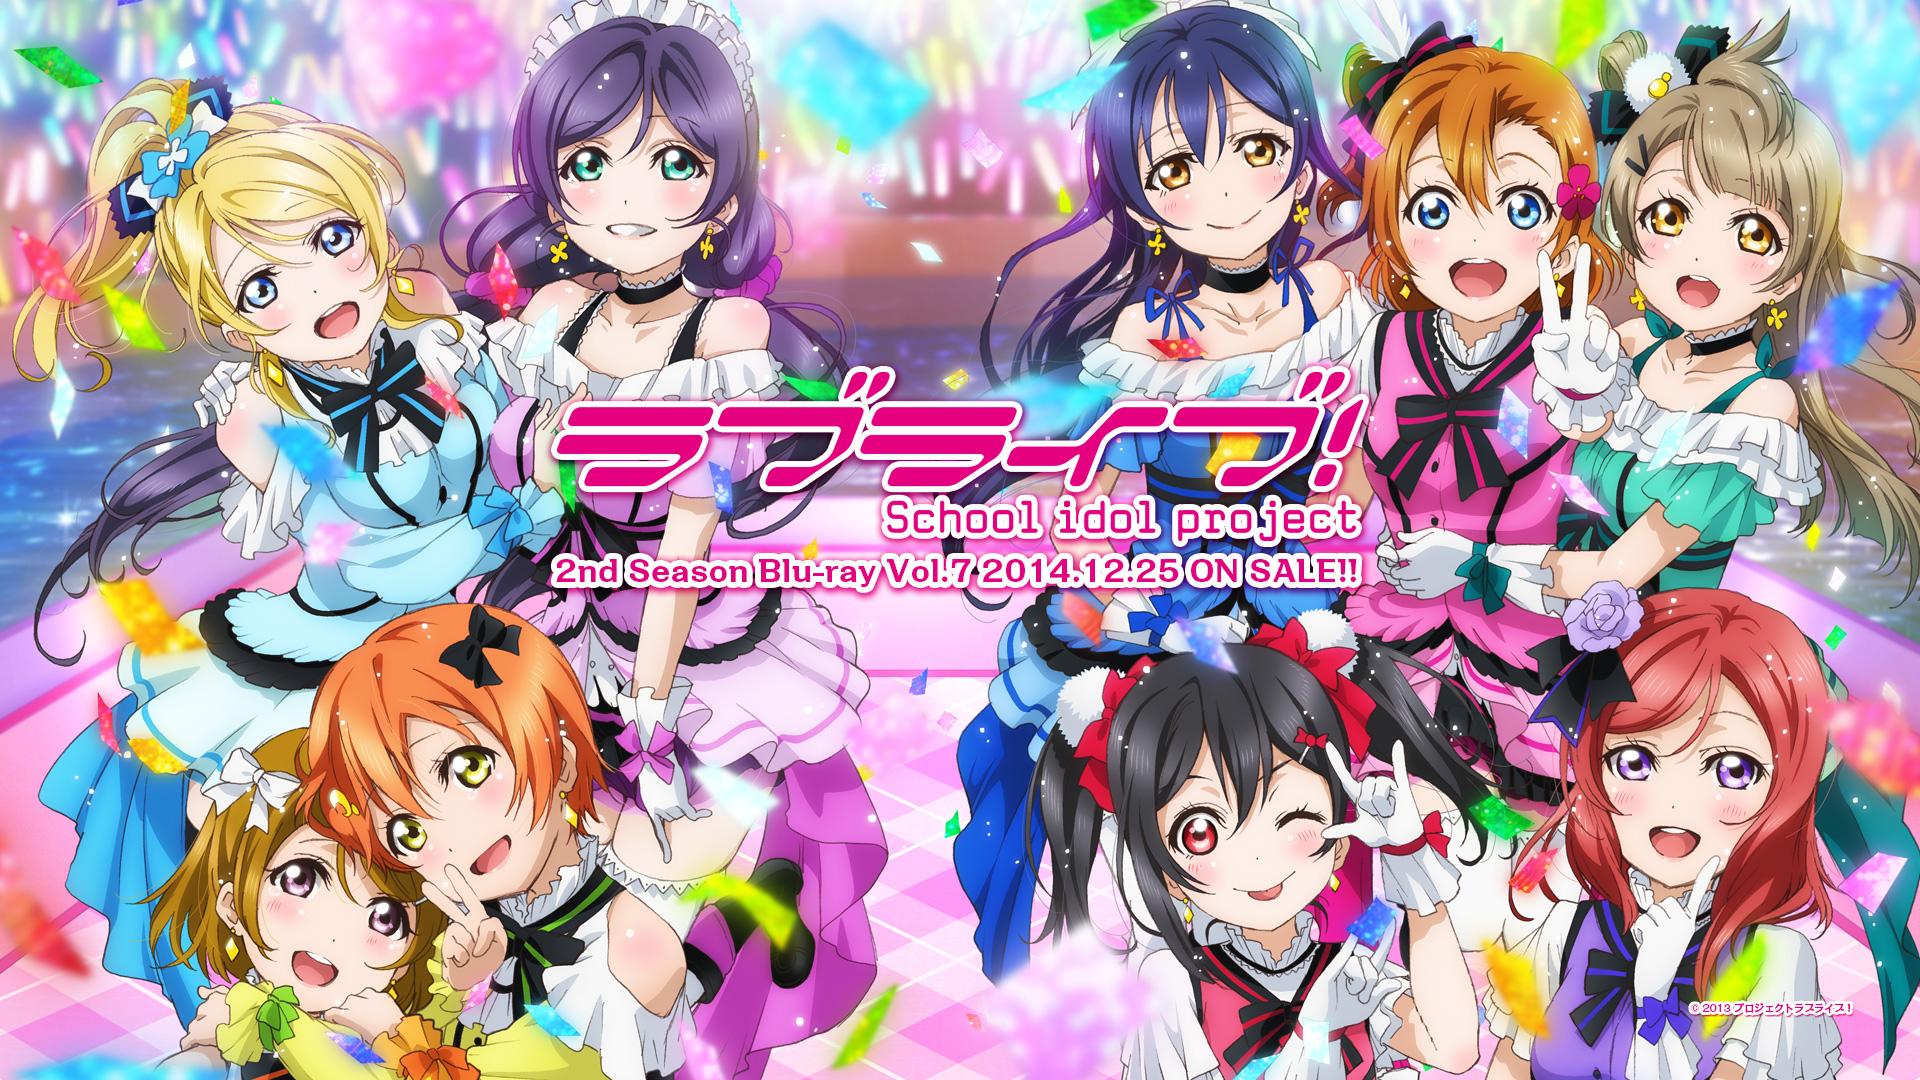 S2 BD7 Promotional Art